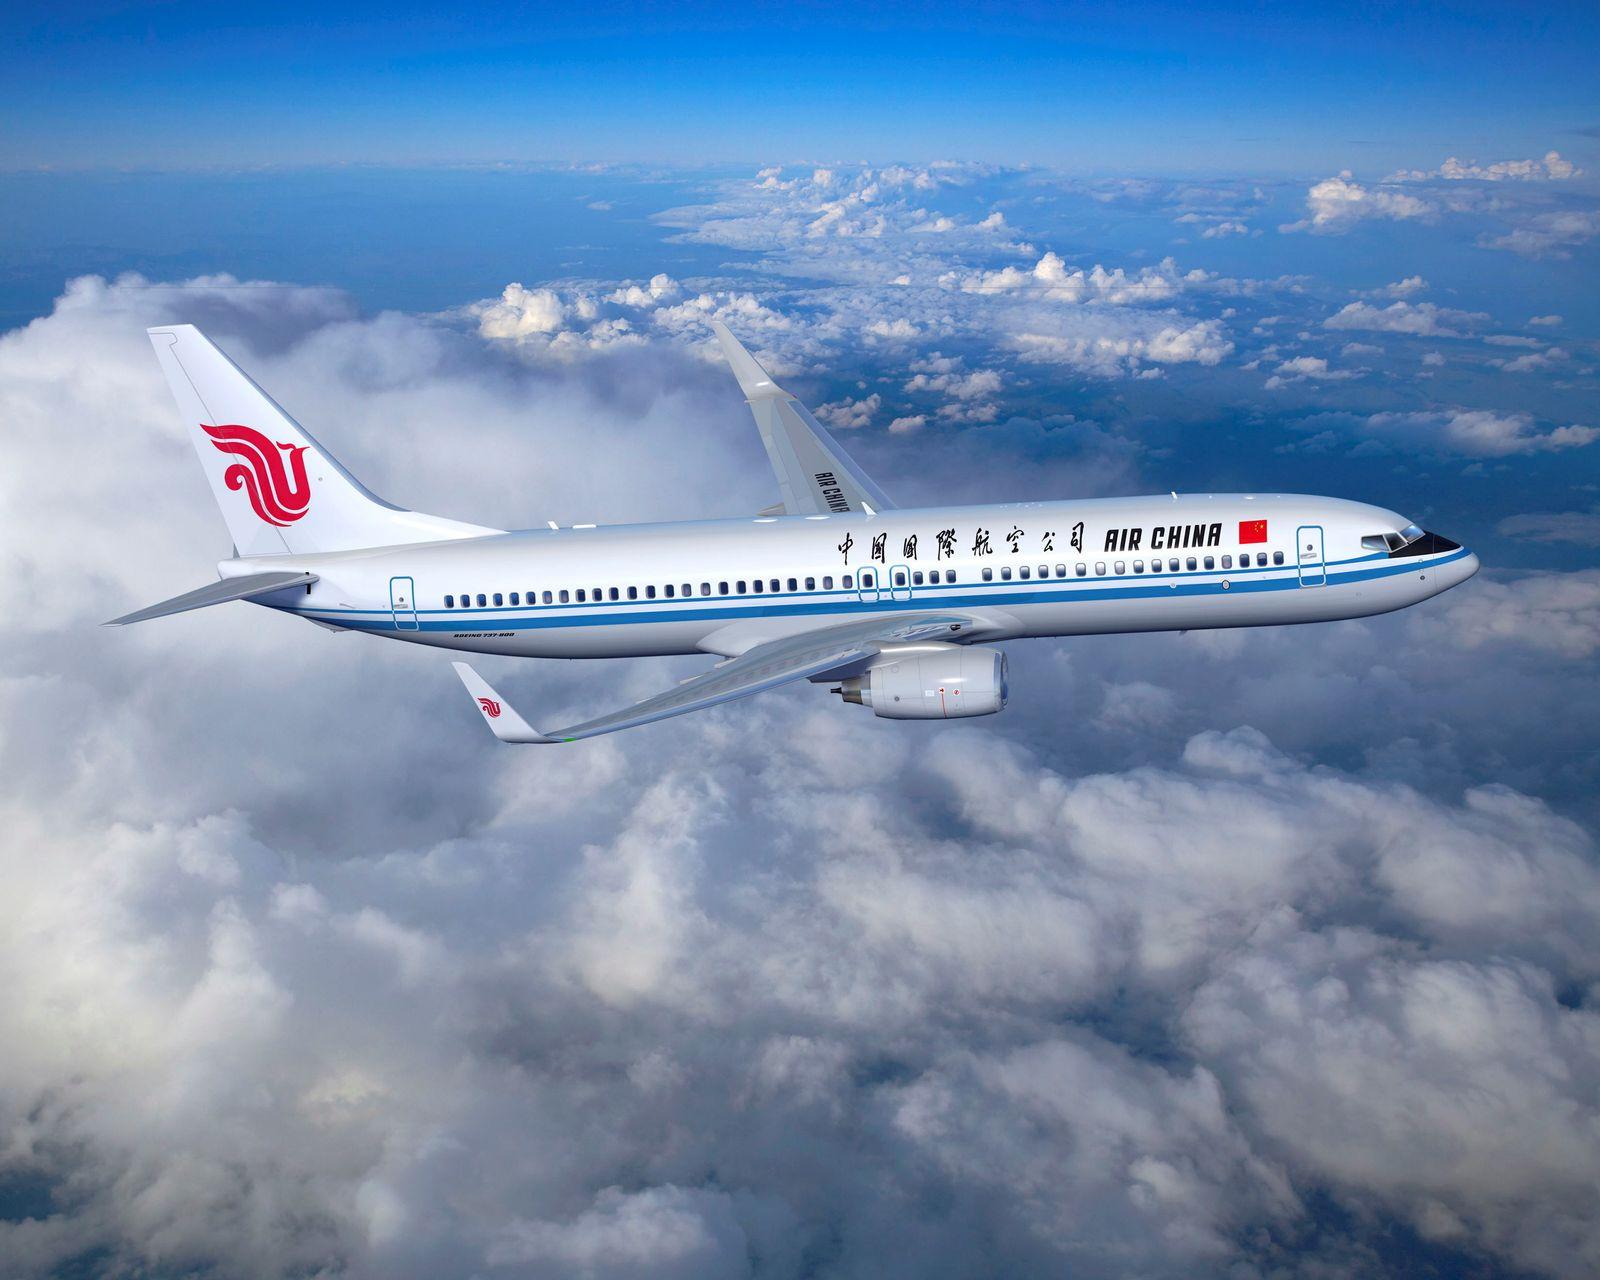 AIR CHINA Boeing 737